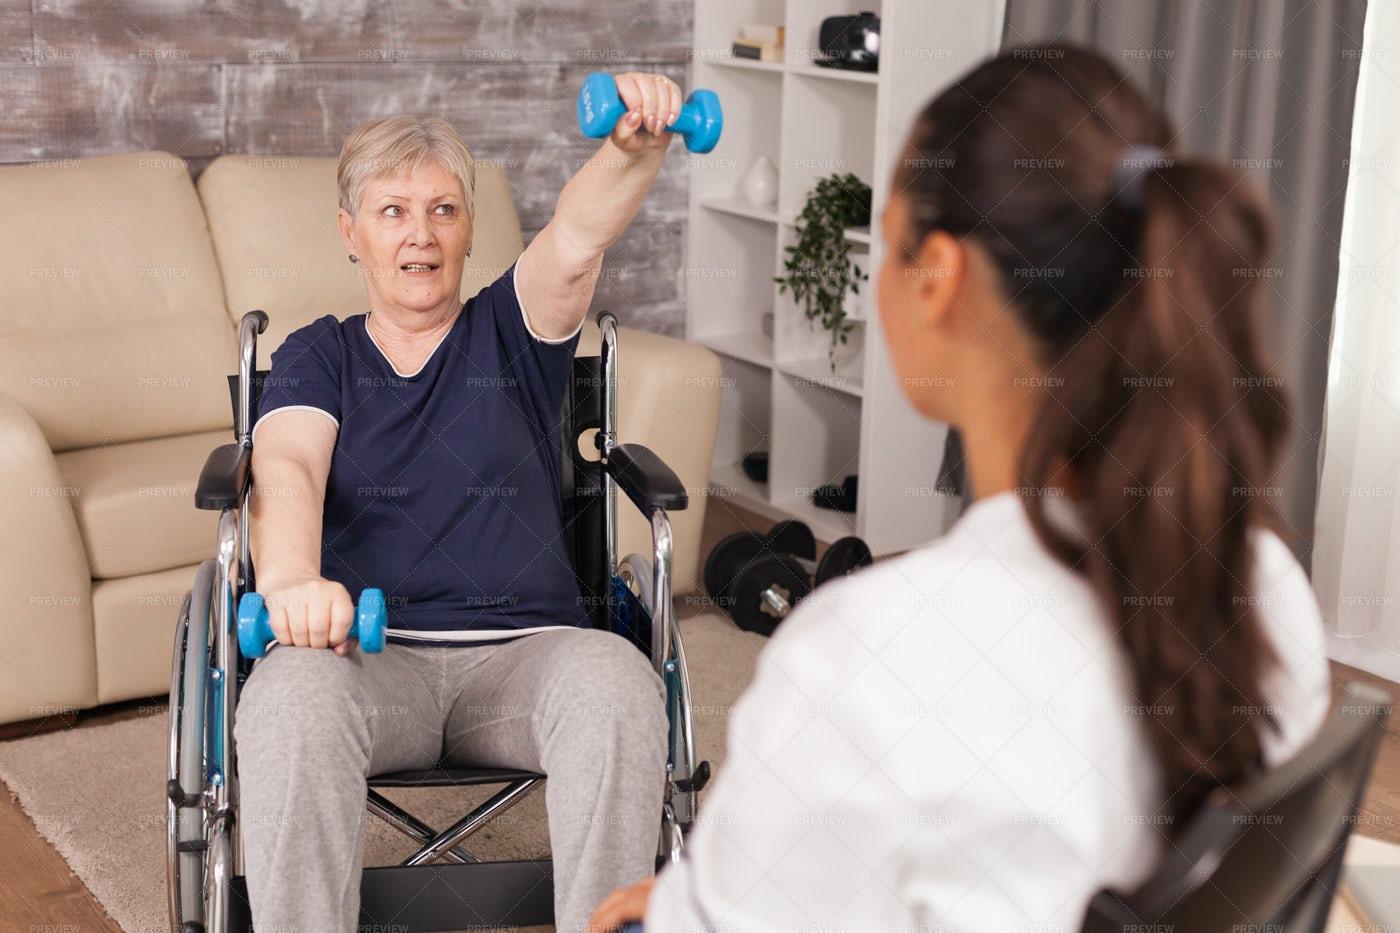 Senior Exercises With Dumbbells: Stock Photos